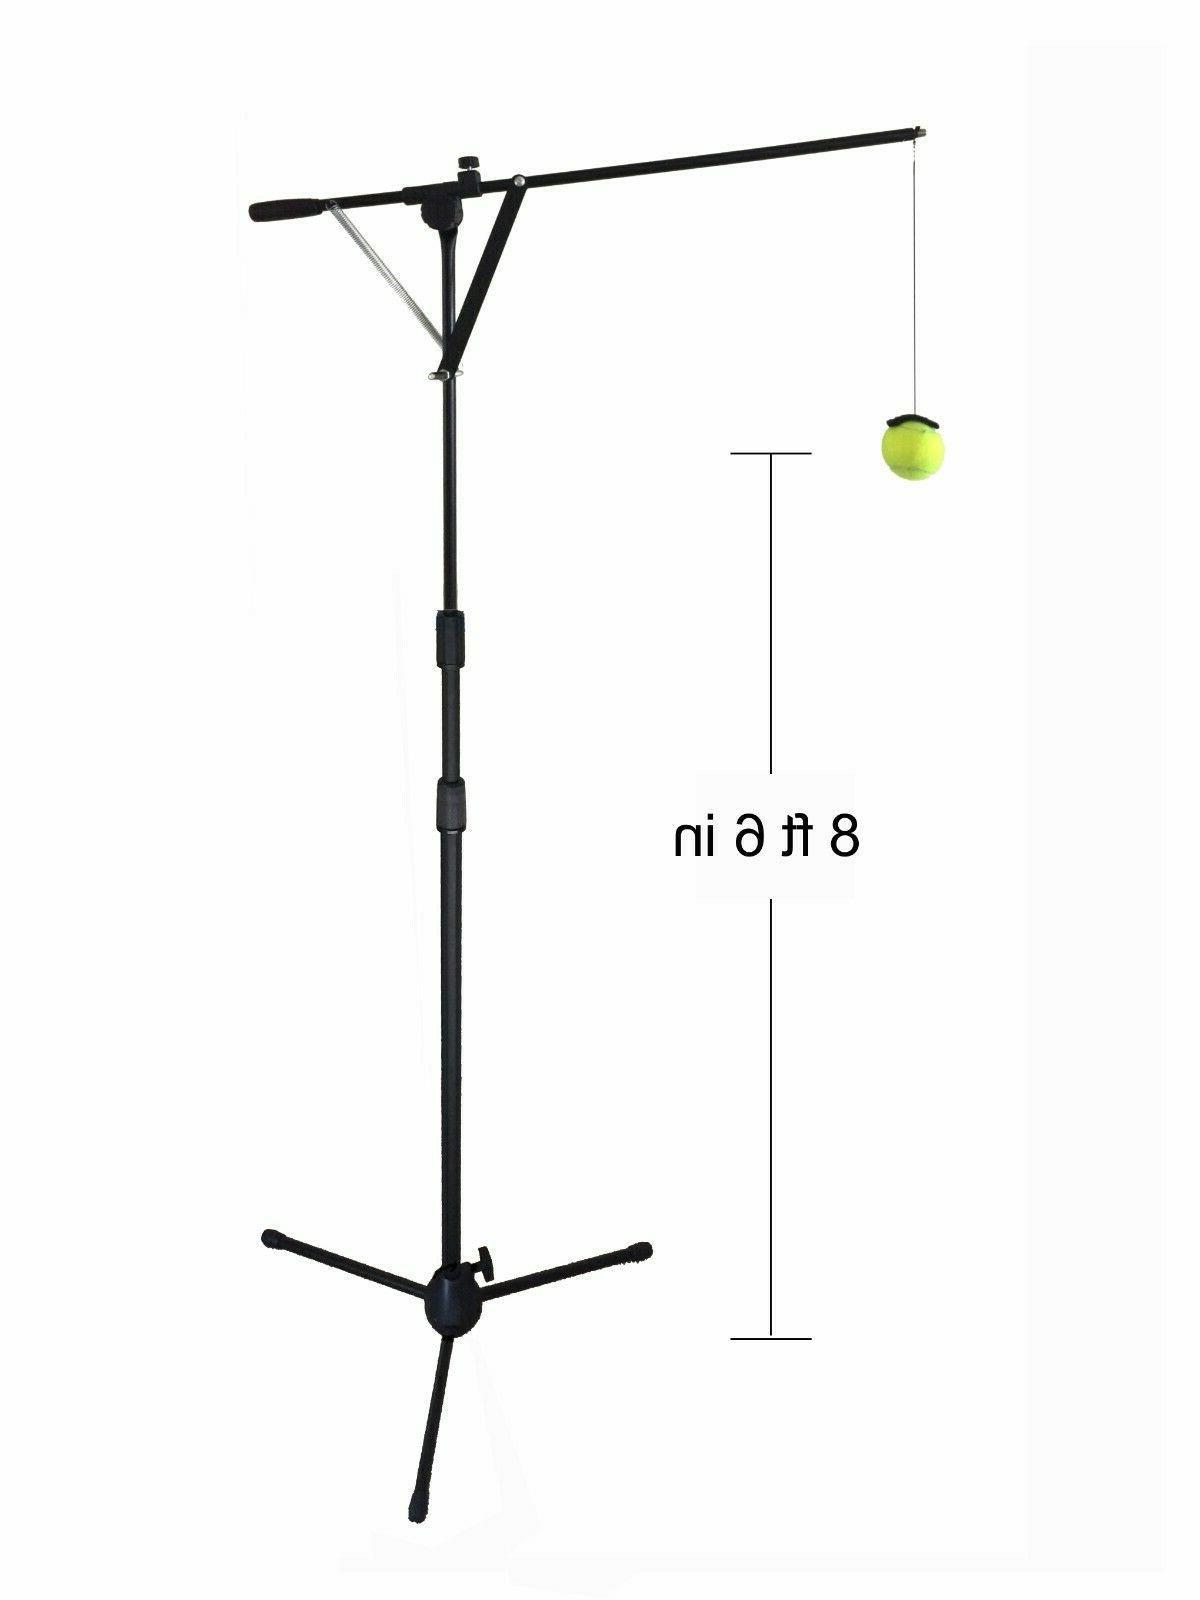 Tennis Serve Equipment.